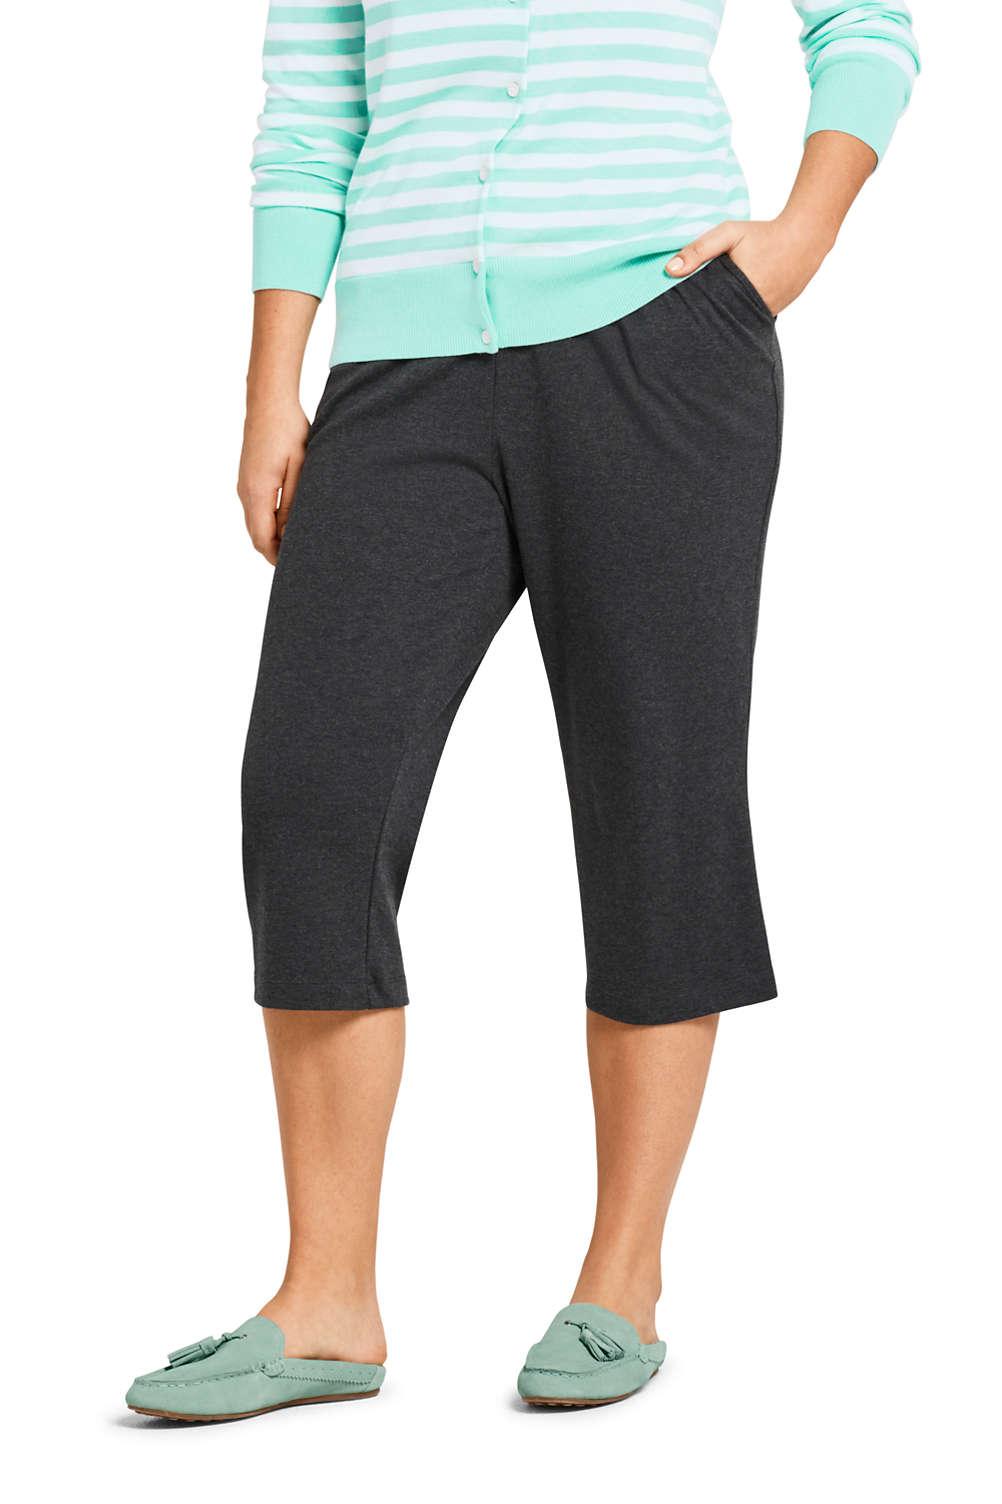 a384baa30042b Women's Plus Size Sport Knit Elastic Waist Pull On Capri Pants from Lands'  End